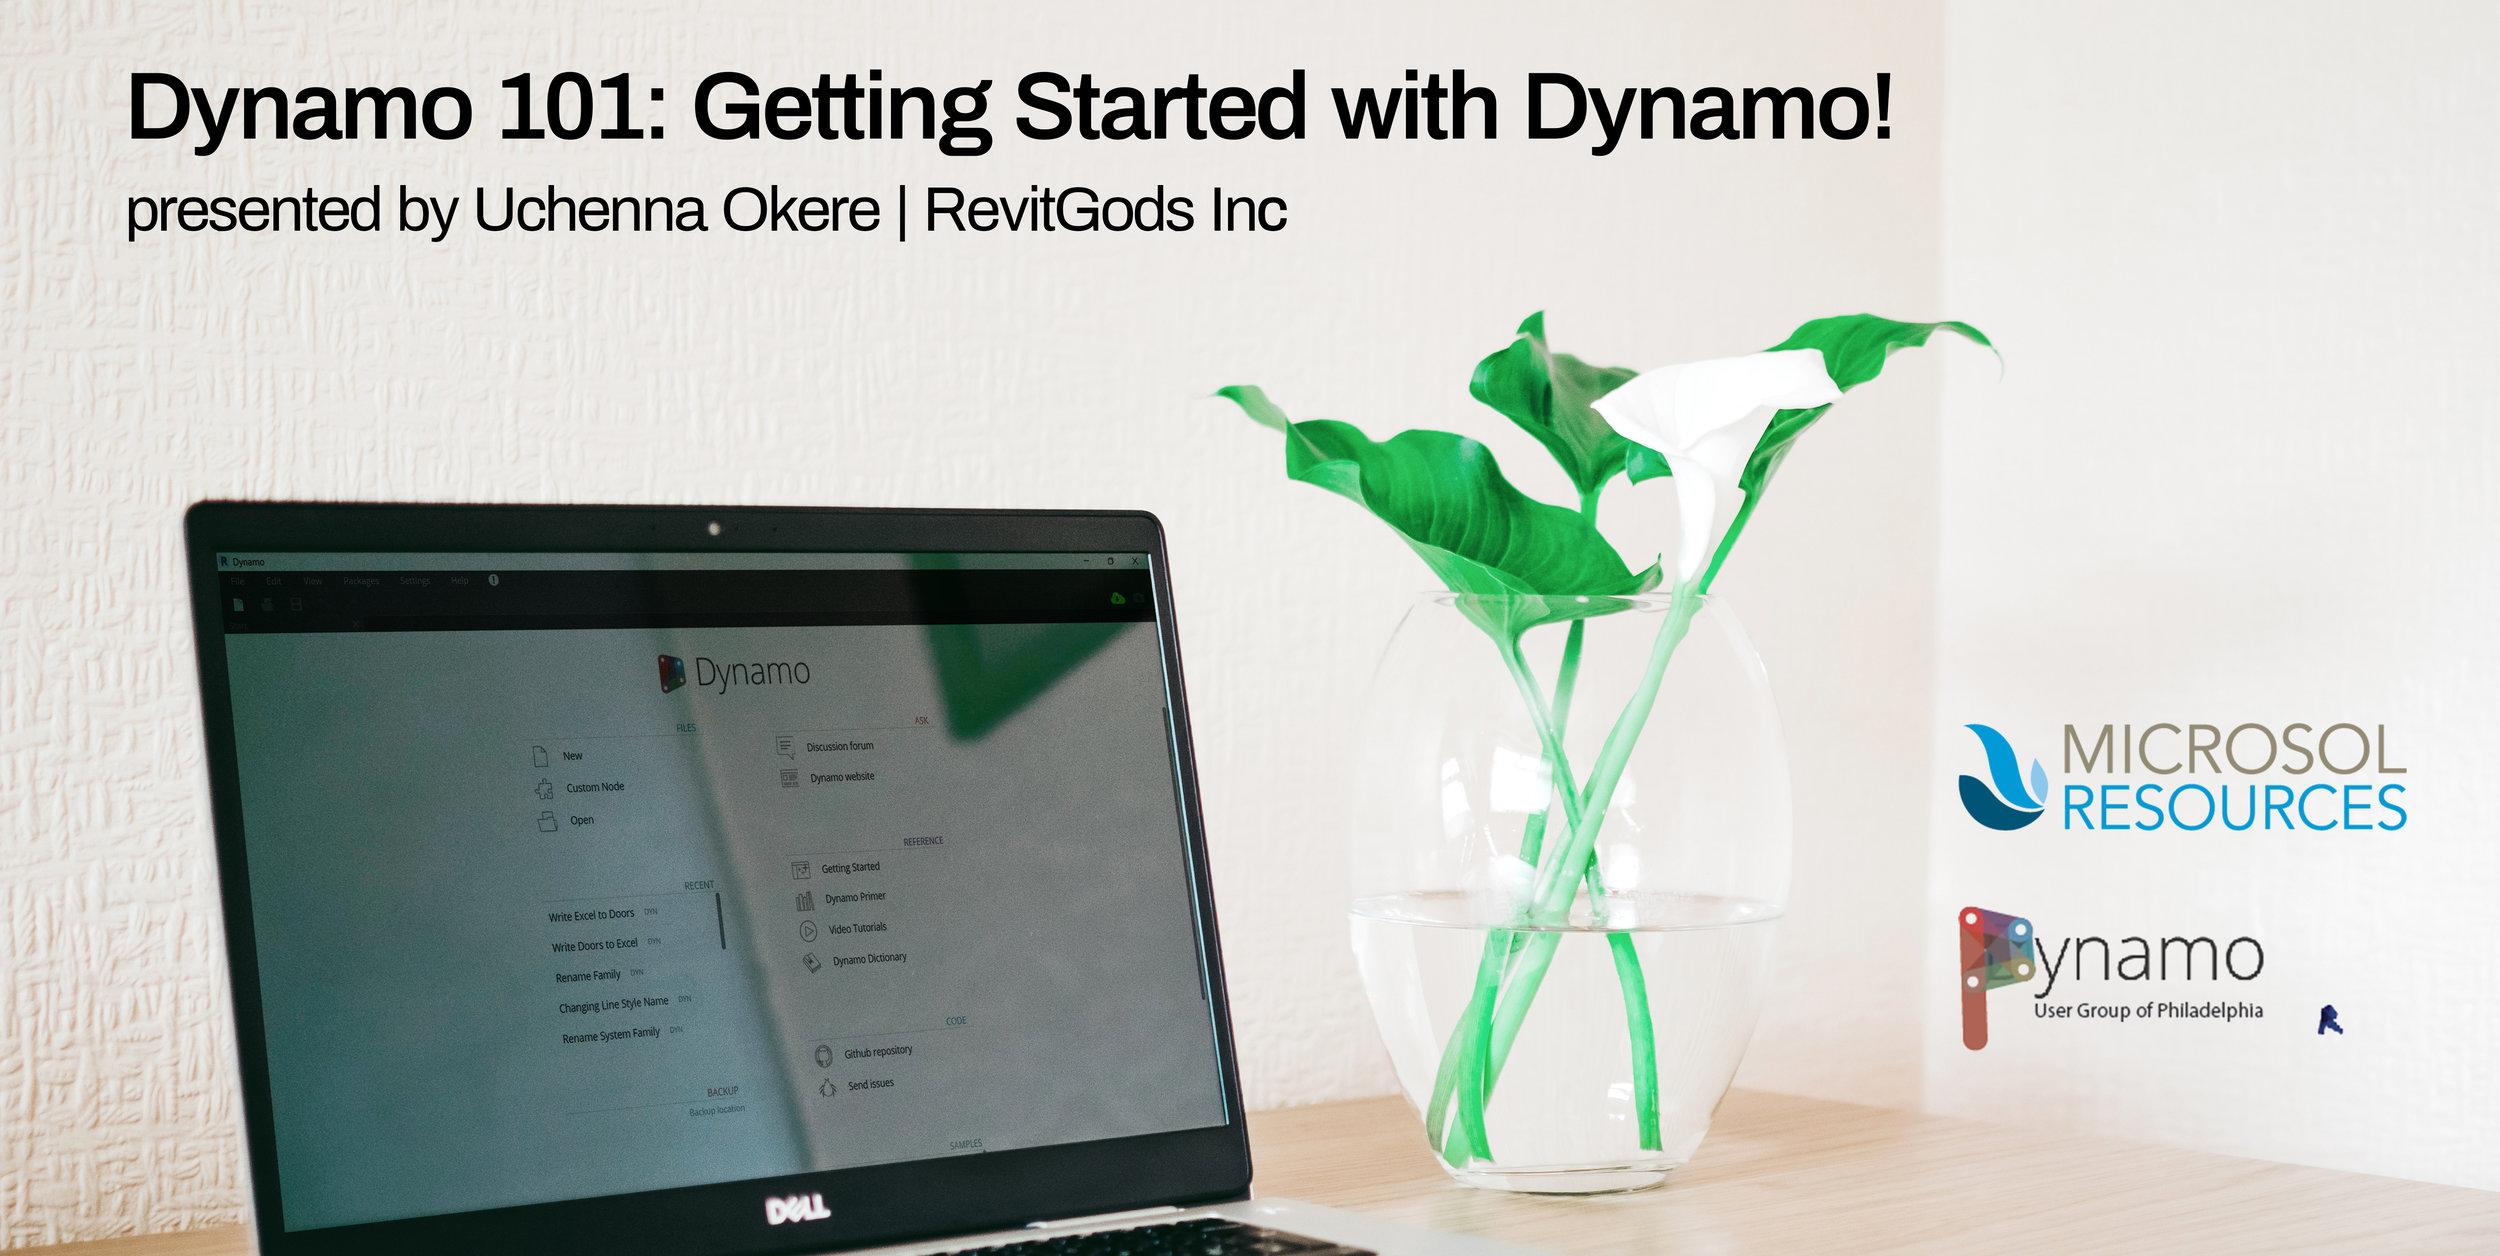 March 13 - Dynamo 101: Getting Started with Dynamo — PDUG